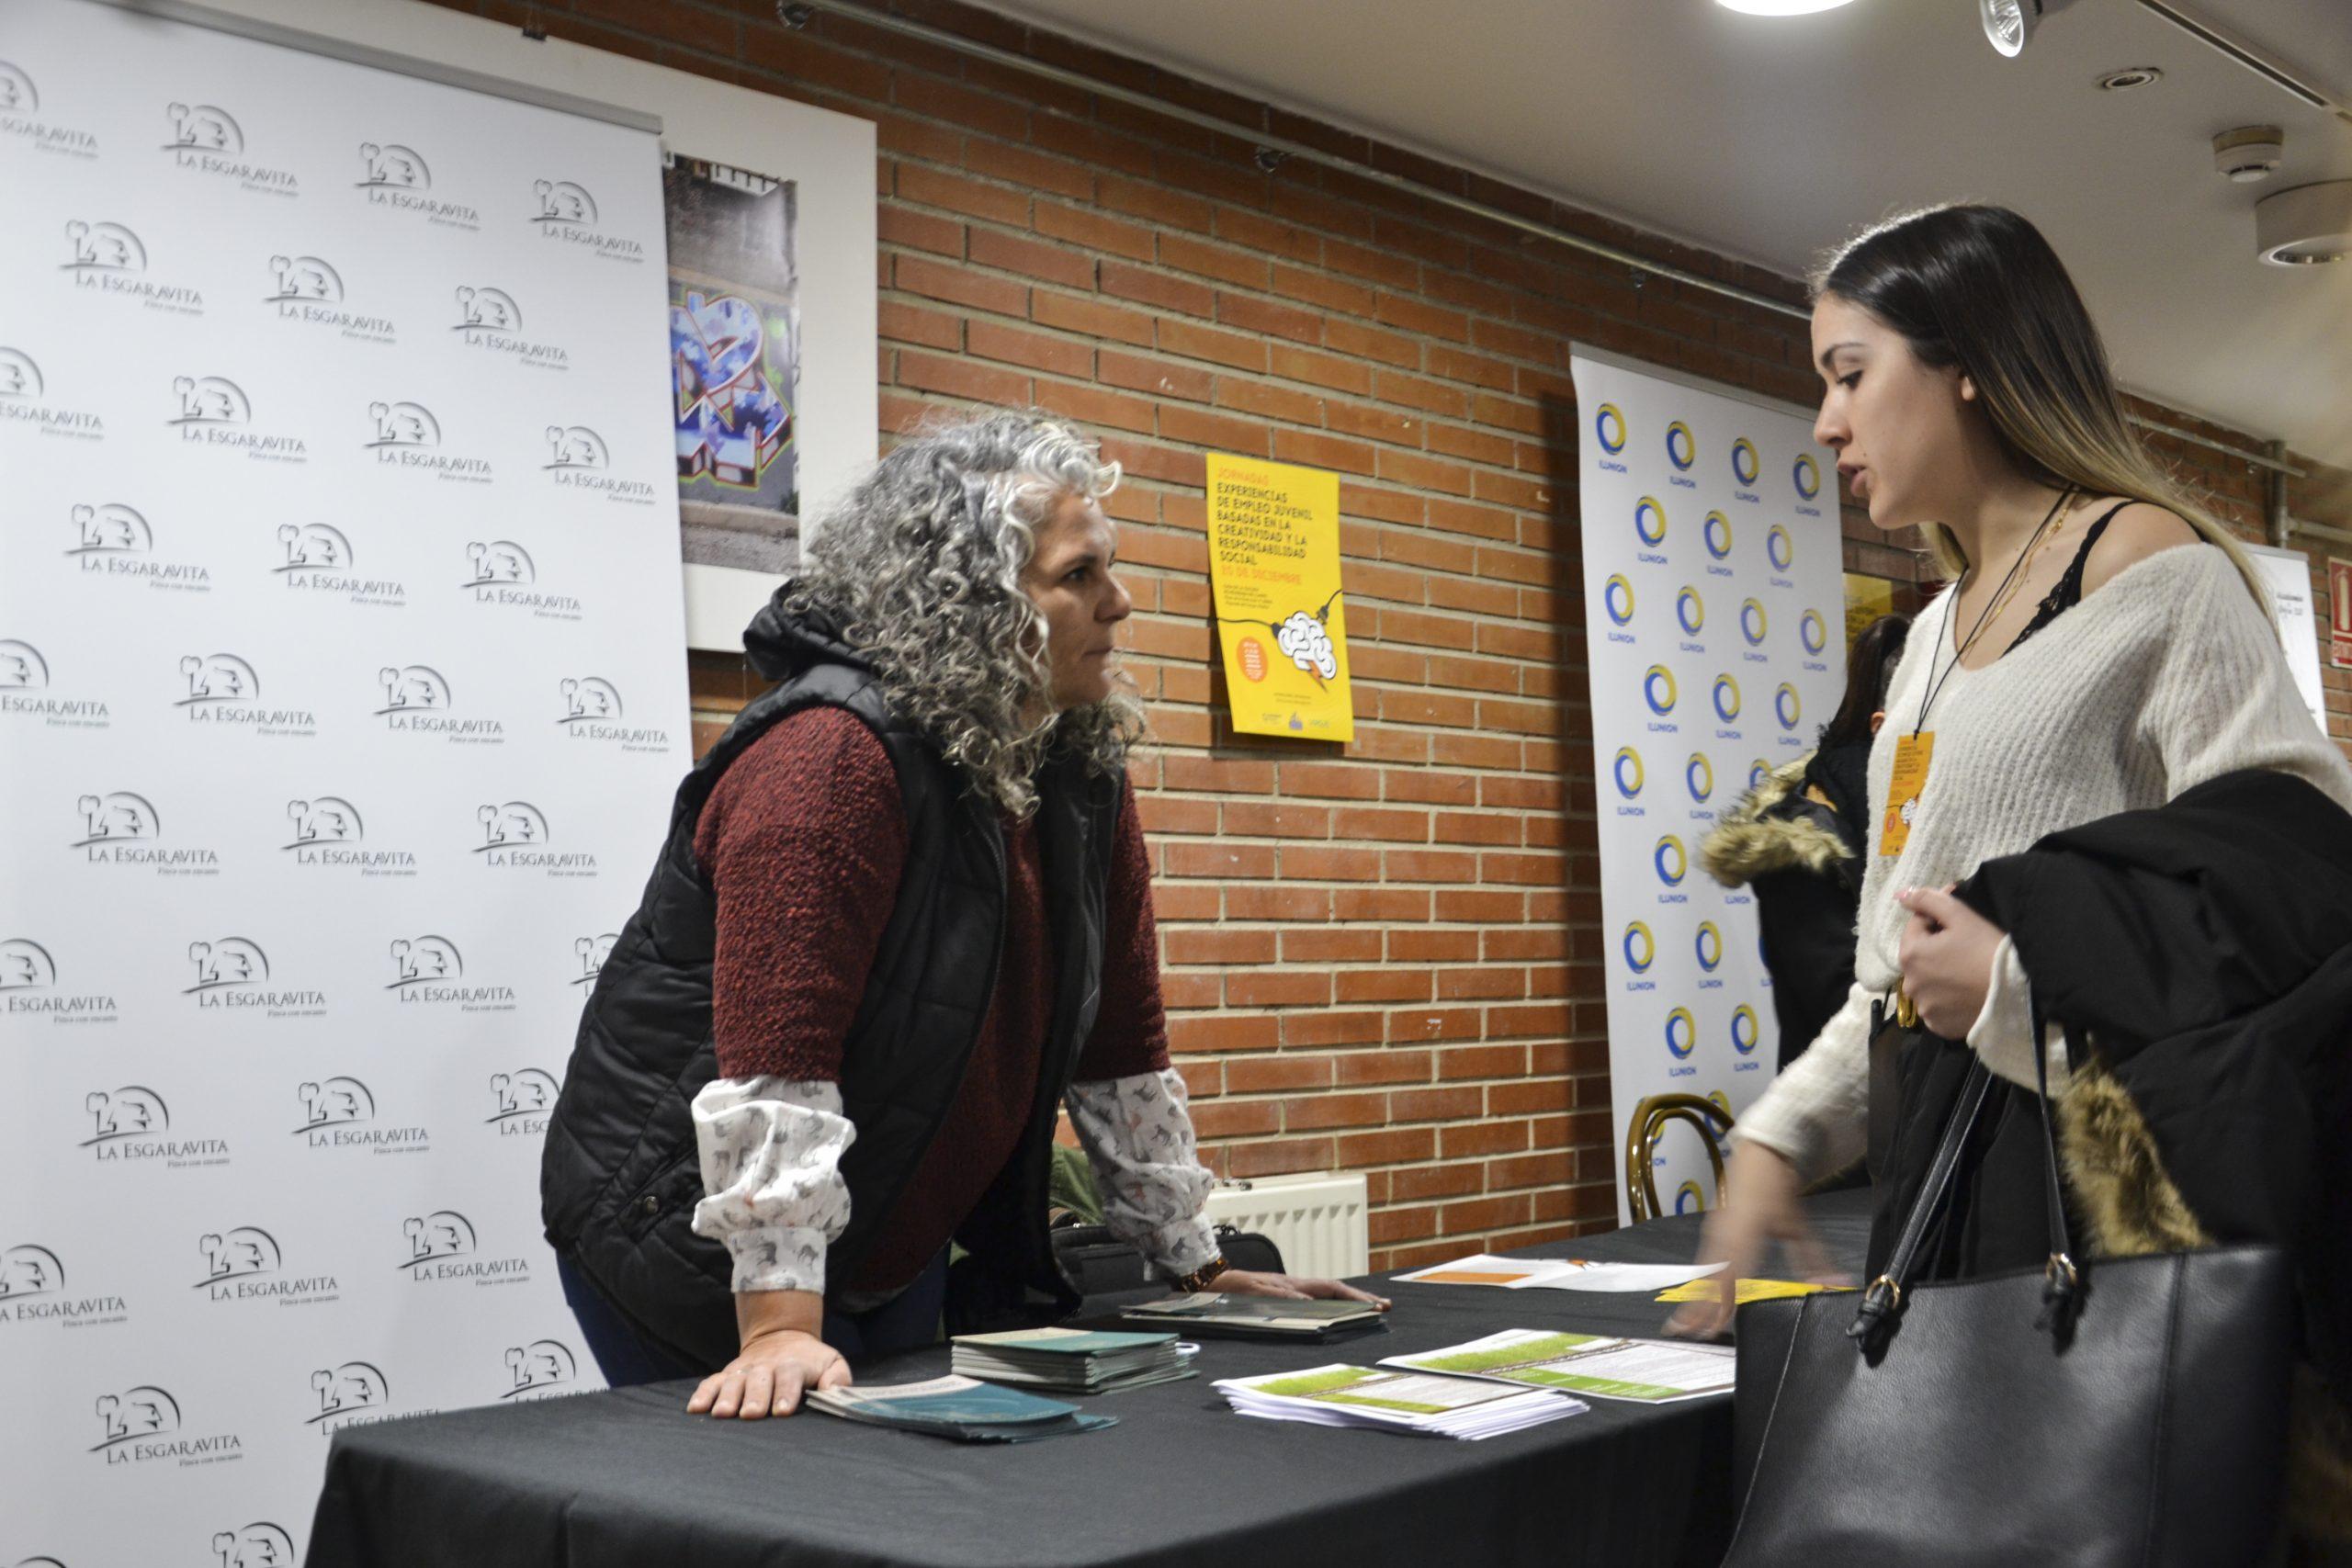 Jornadas-Mejorada-20-12-2018-7-scaled